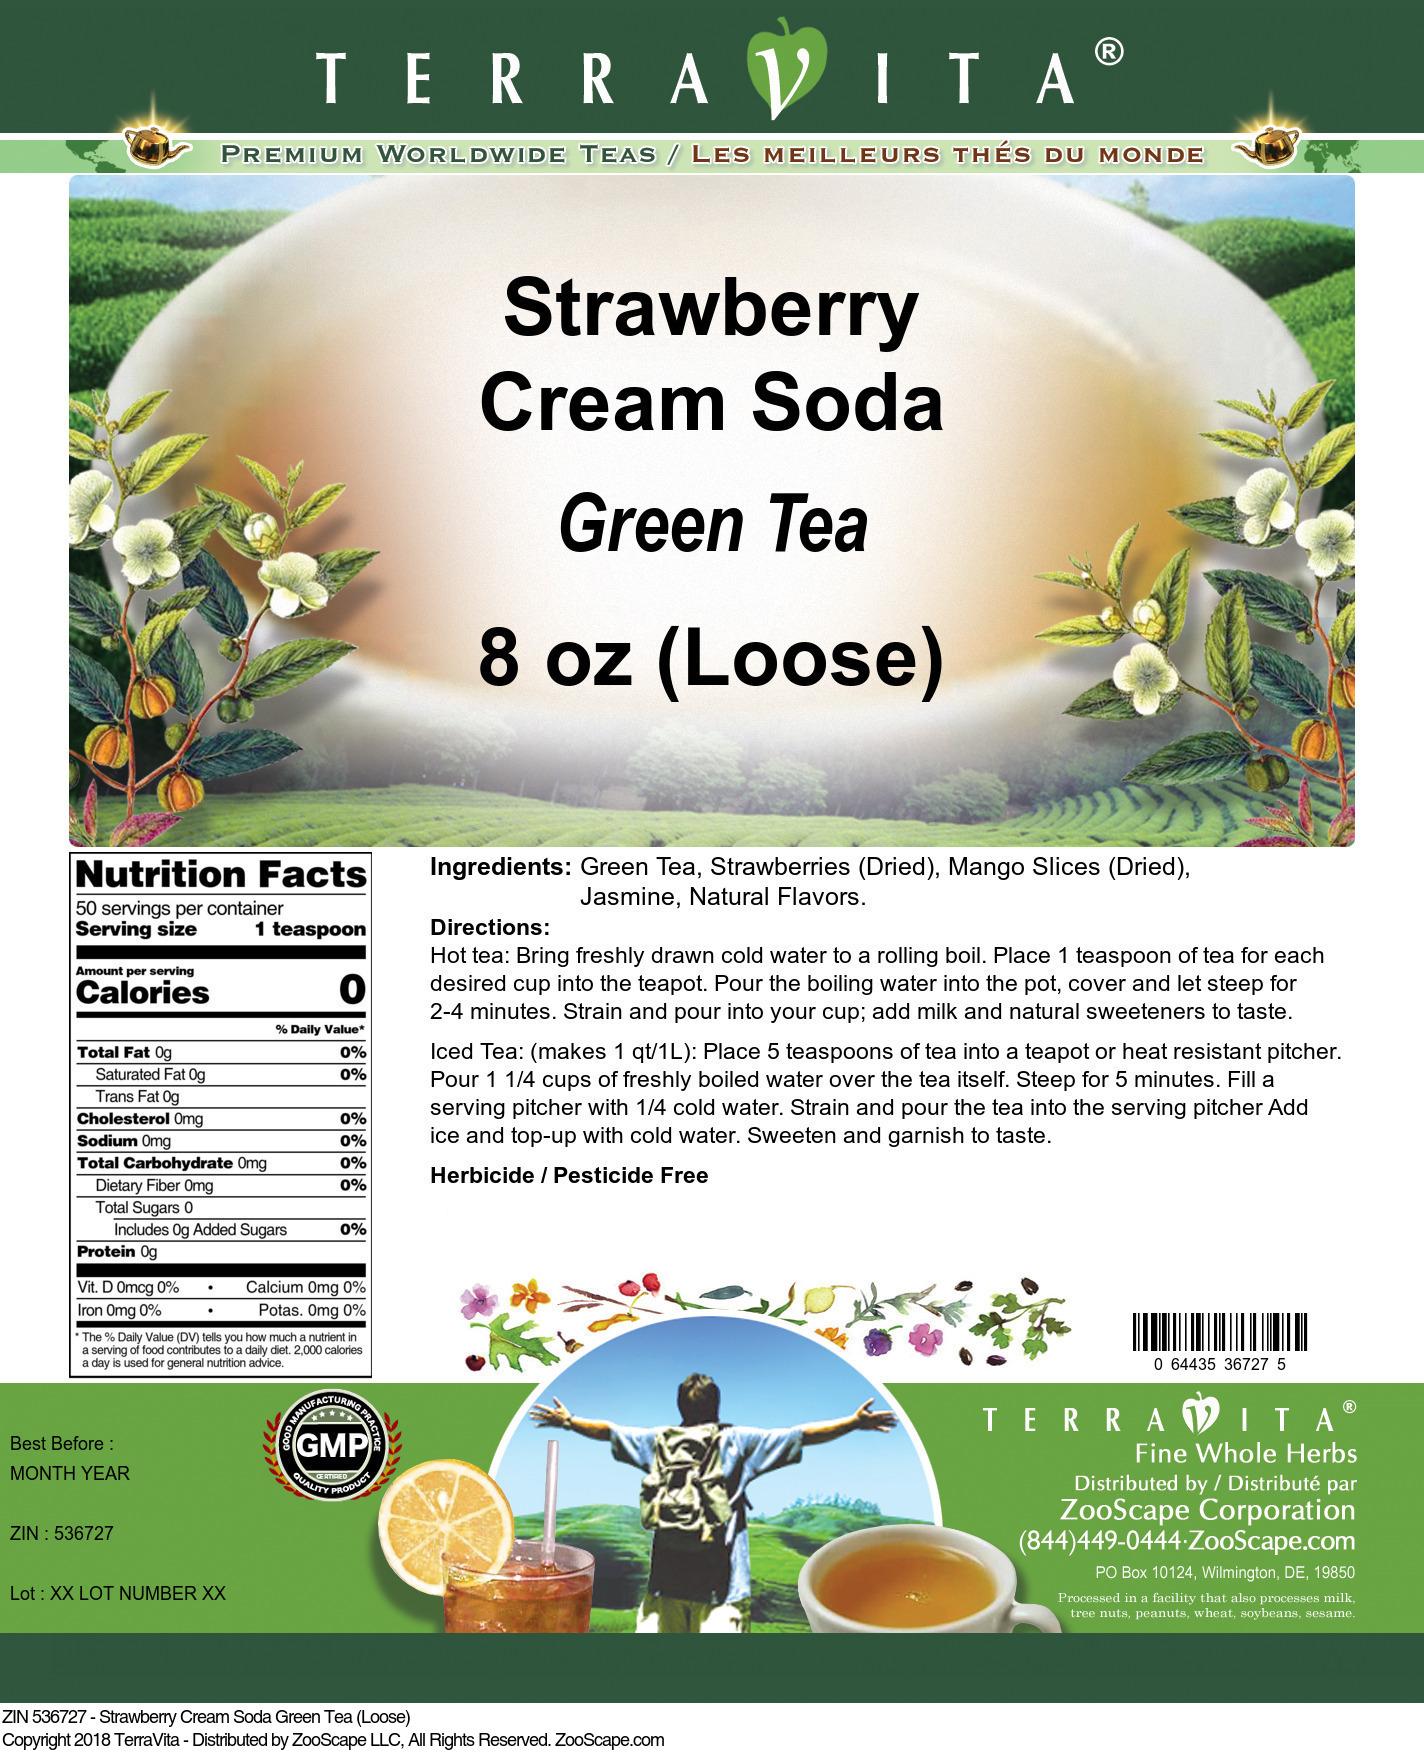 Strawberry Cream Soda Green Tea (Loose)